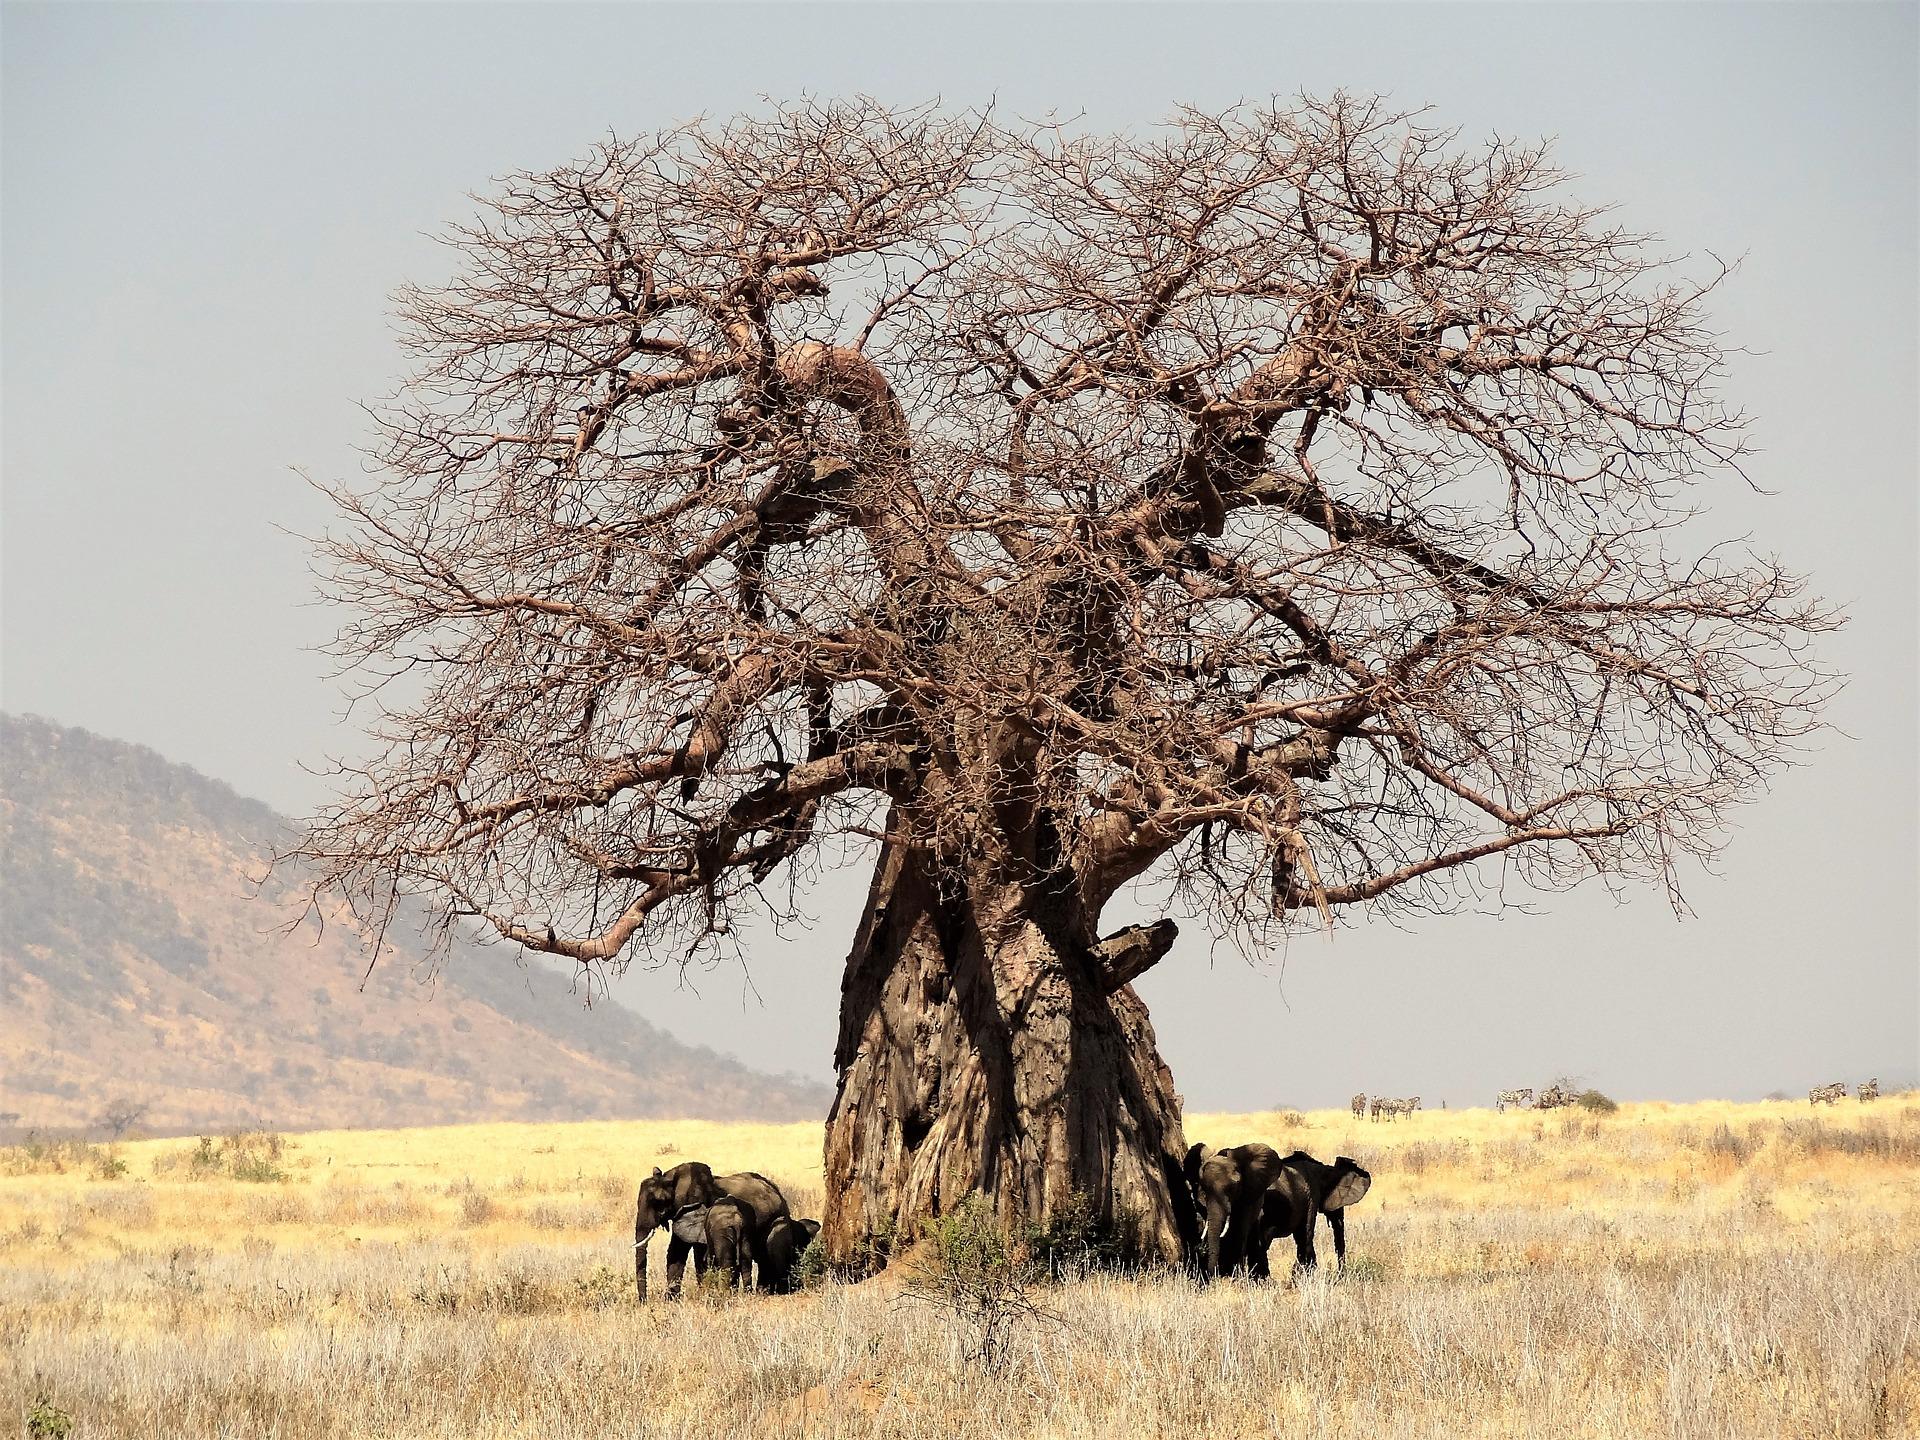 Séjour en Tanzanie-Baobab et éléphants en Tanzanie